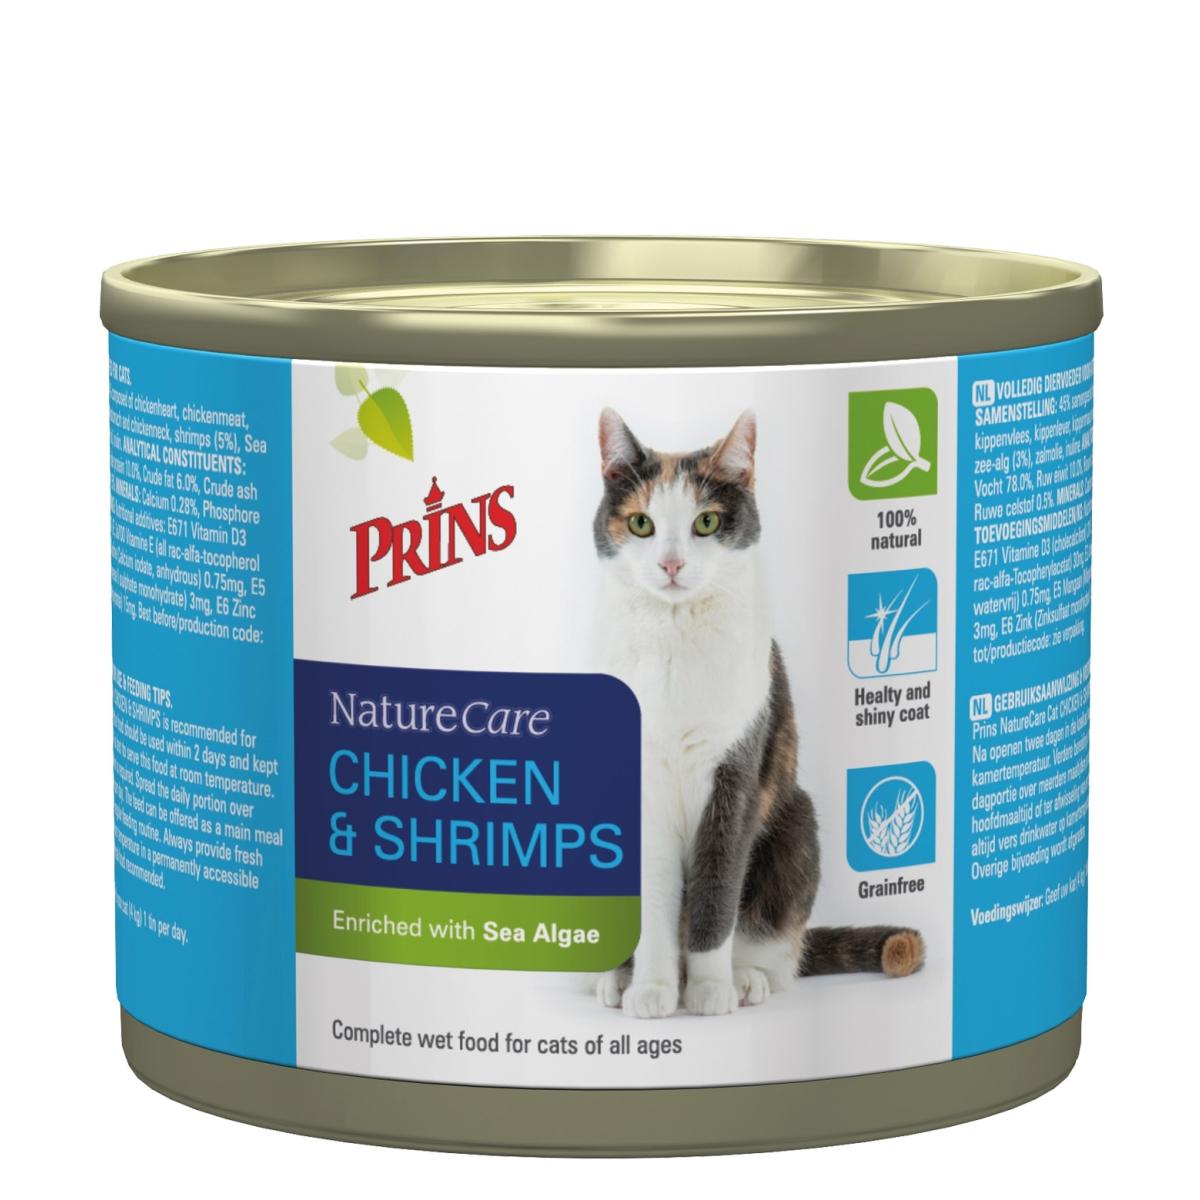 PRI NC CAT CHIC&SHRIMPS2X200GR J 00003